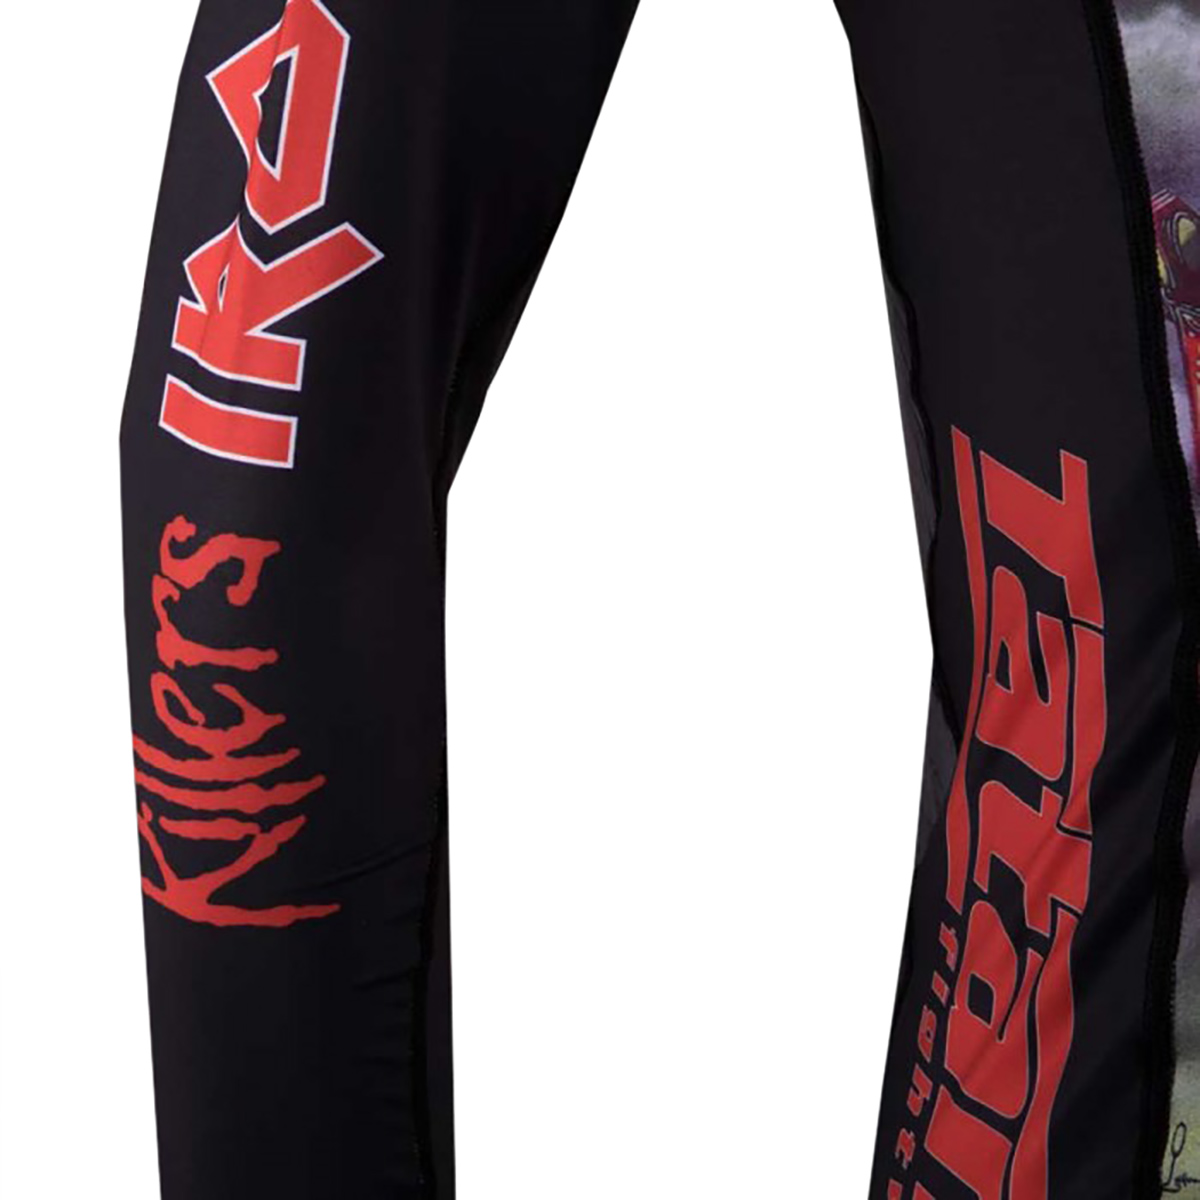 Tatami Iron Maiden The Killers MMA BJJ Jiu Jitsu LongSleeve LS Rashguard Rash